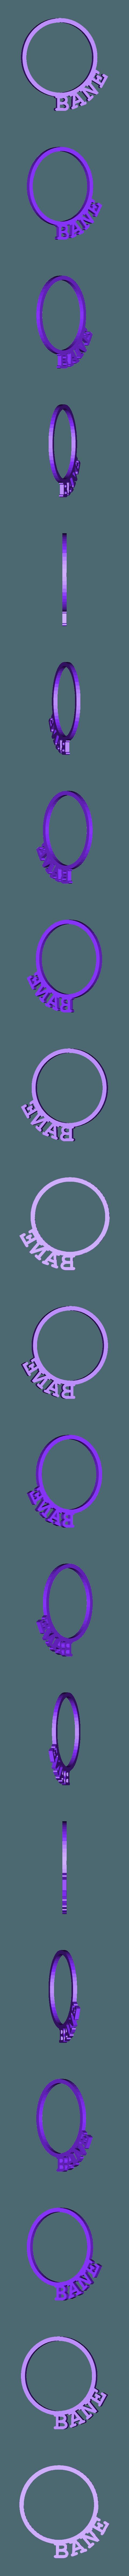 LRingBane.stl Download STL file D&D Condition Rings • 3D printable design, Jinja